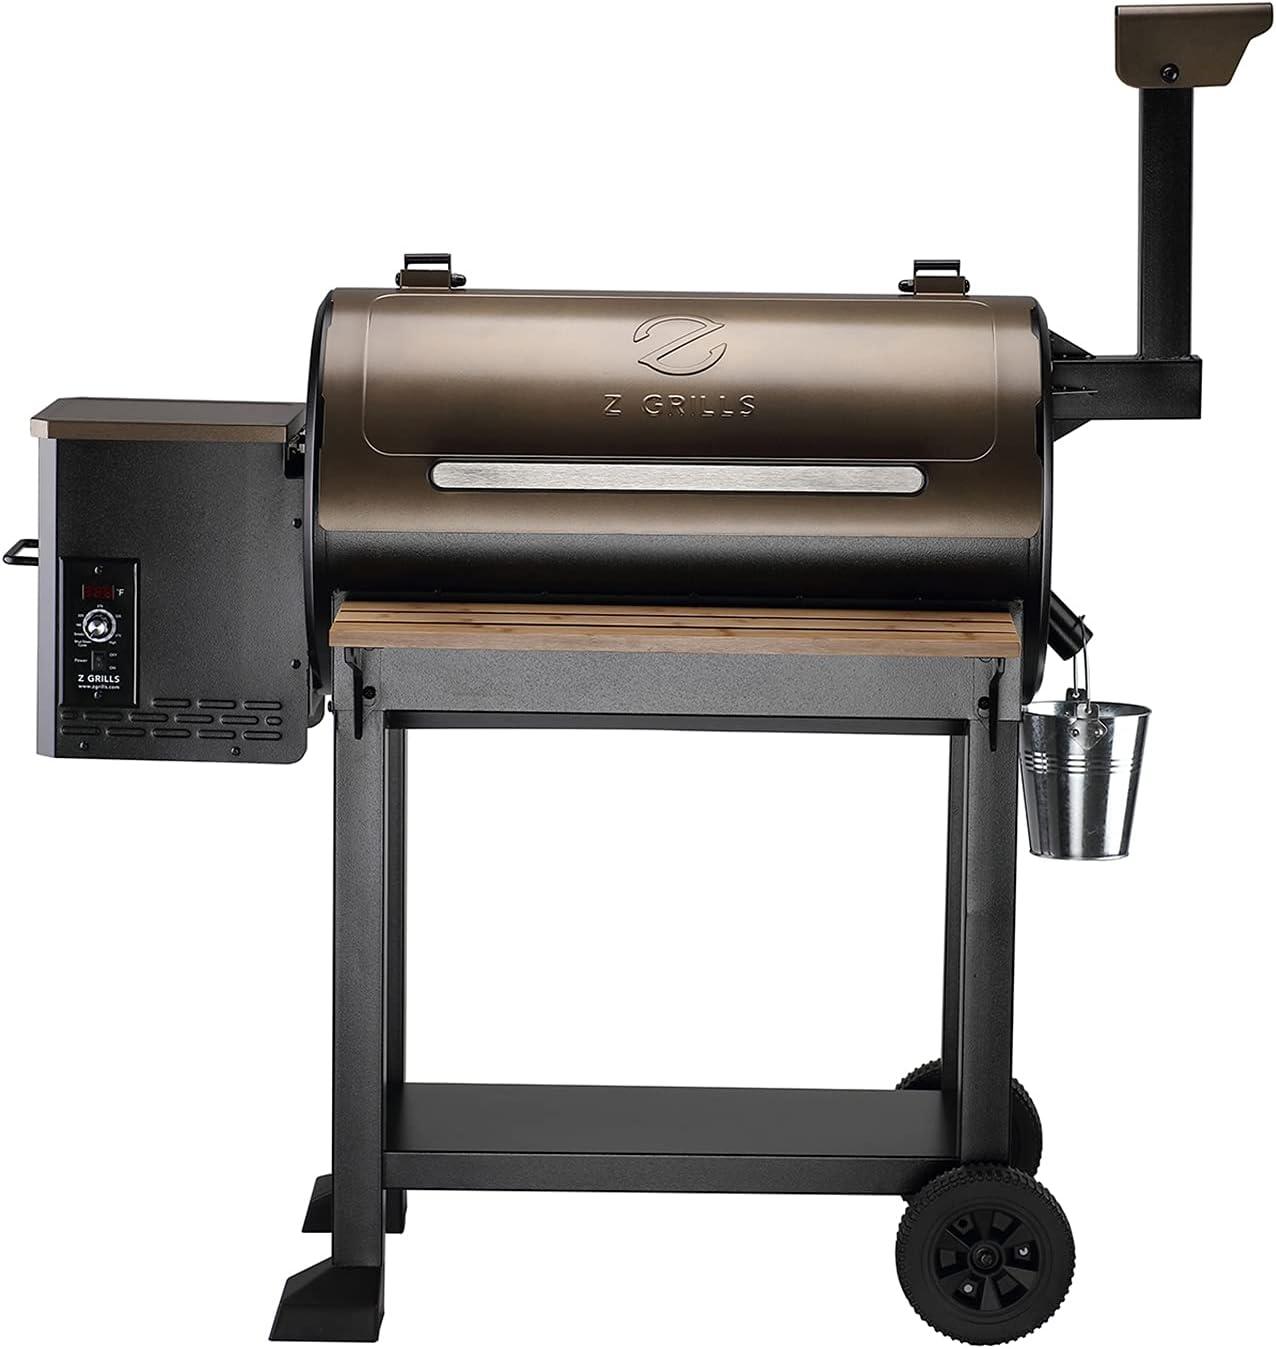 Z GRILLS 2021 Upgrade Elegant Challenge the lowest price Wood Pellet Smoker Grills 55 8-in-1 Grill